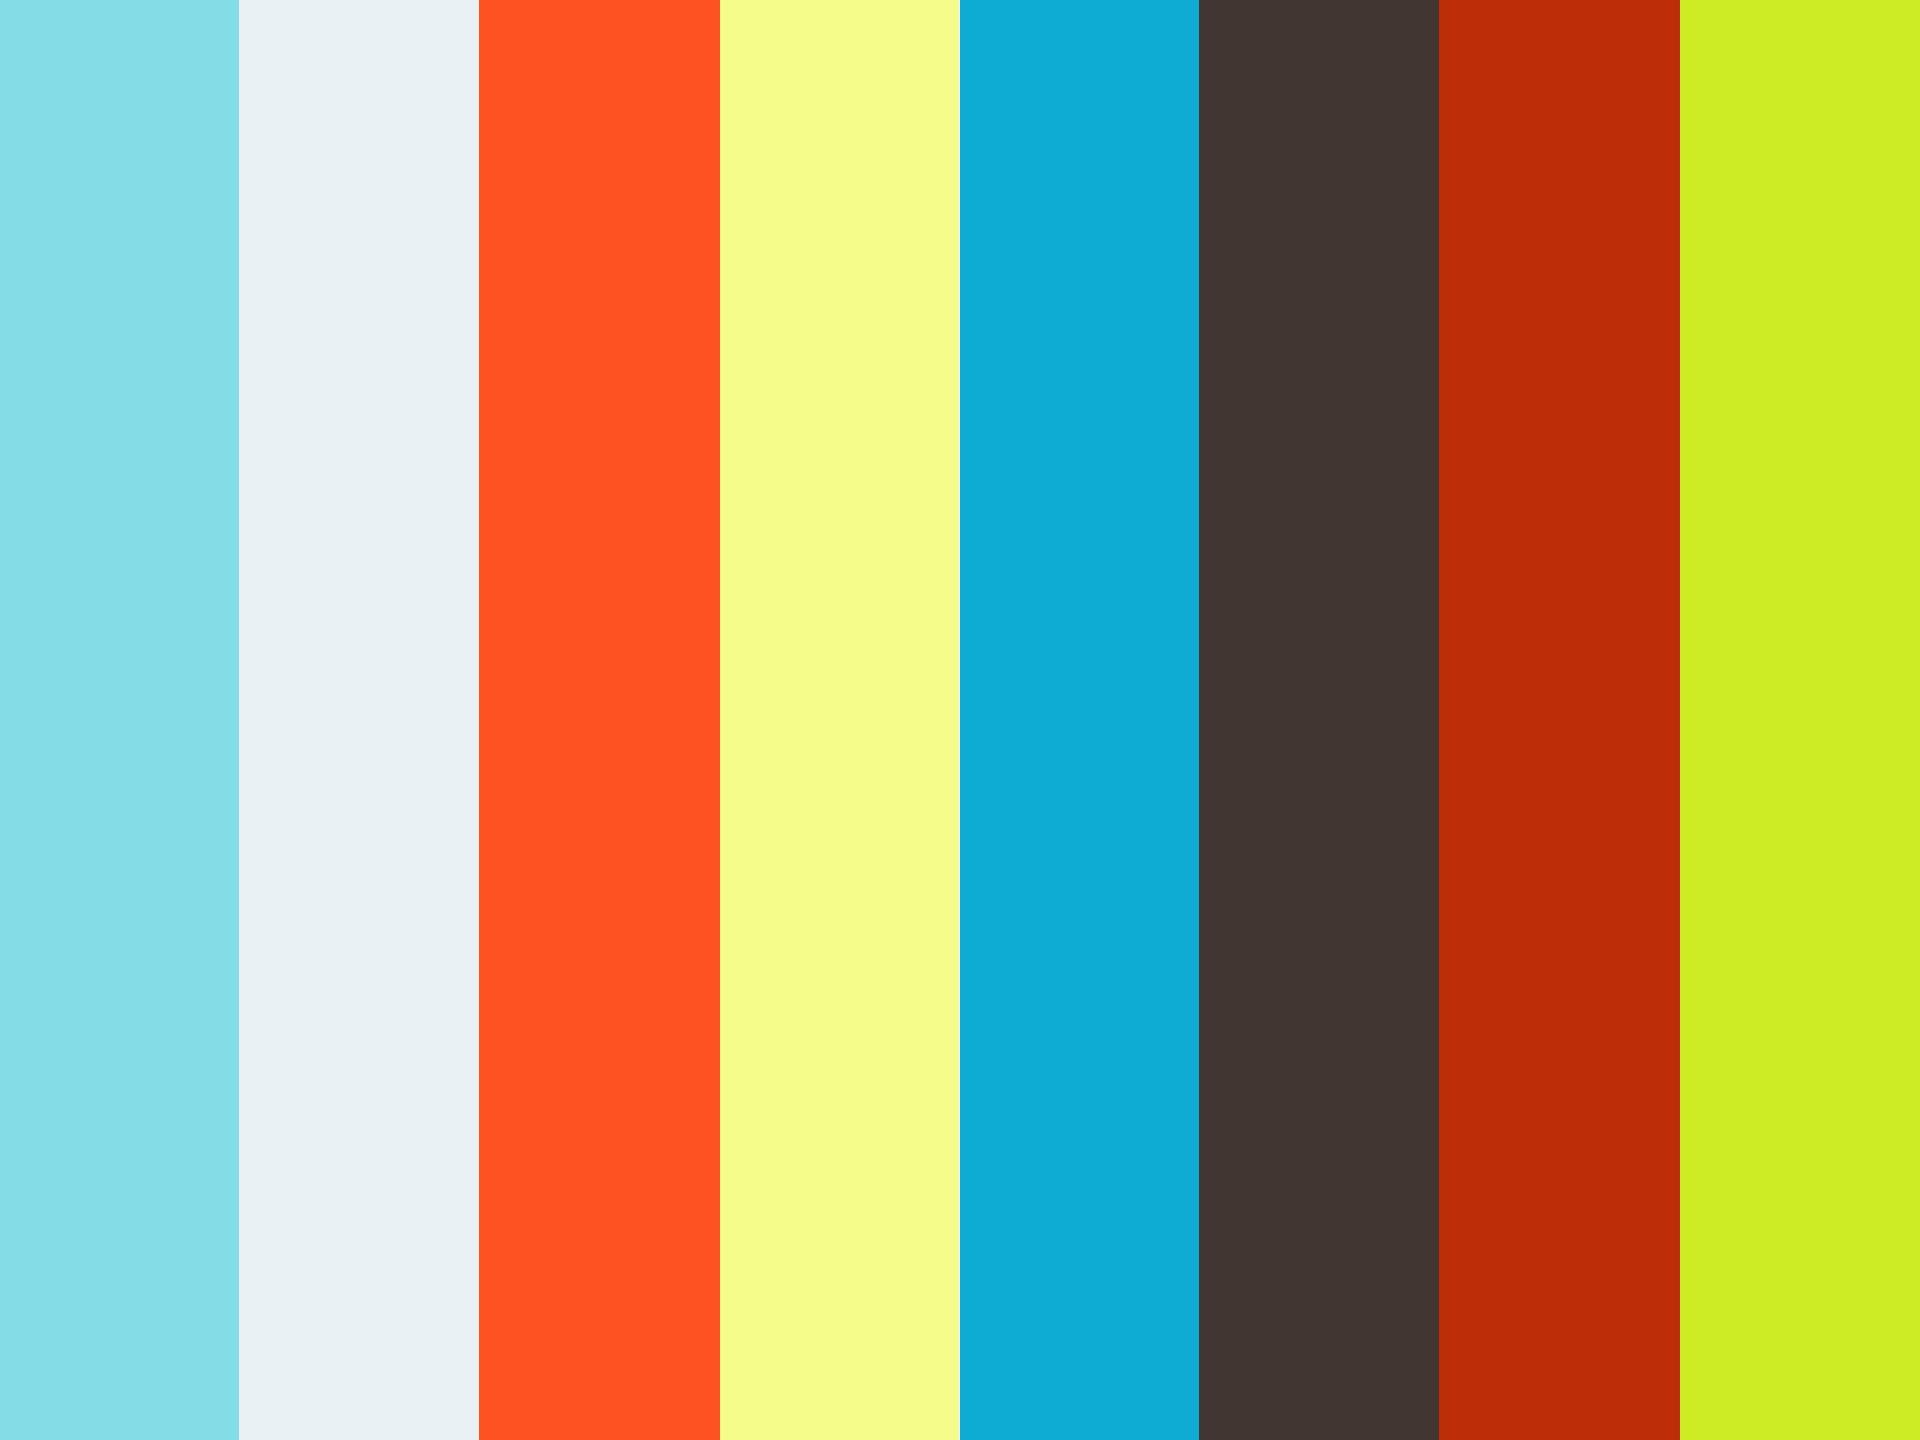 NEW! MERCEDES BENZ GTR BLACK SERIES - ORANGE - 2021